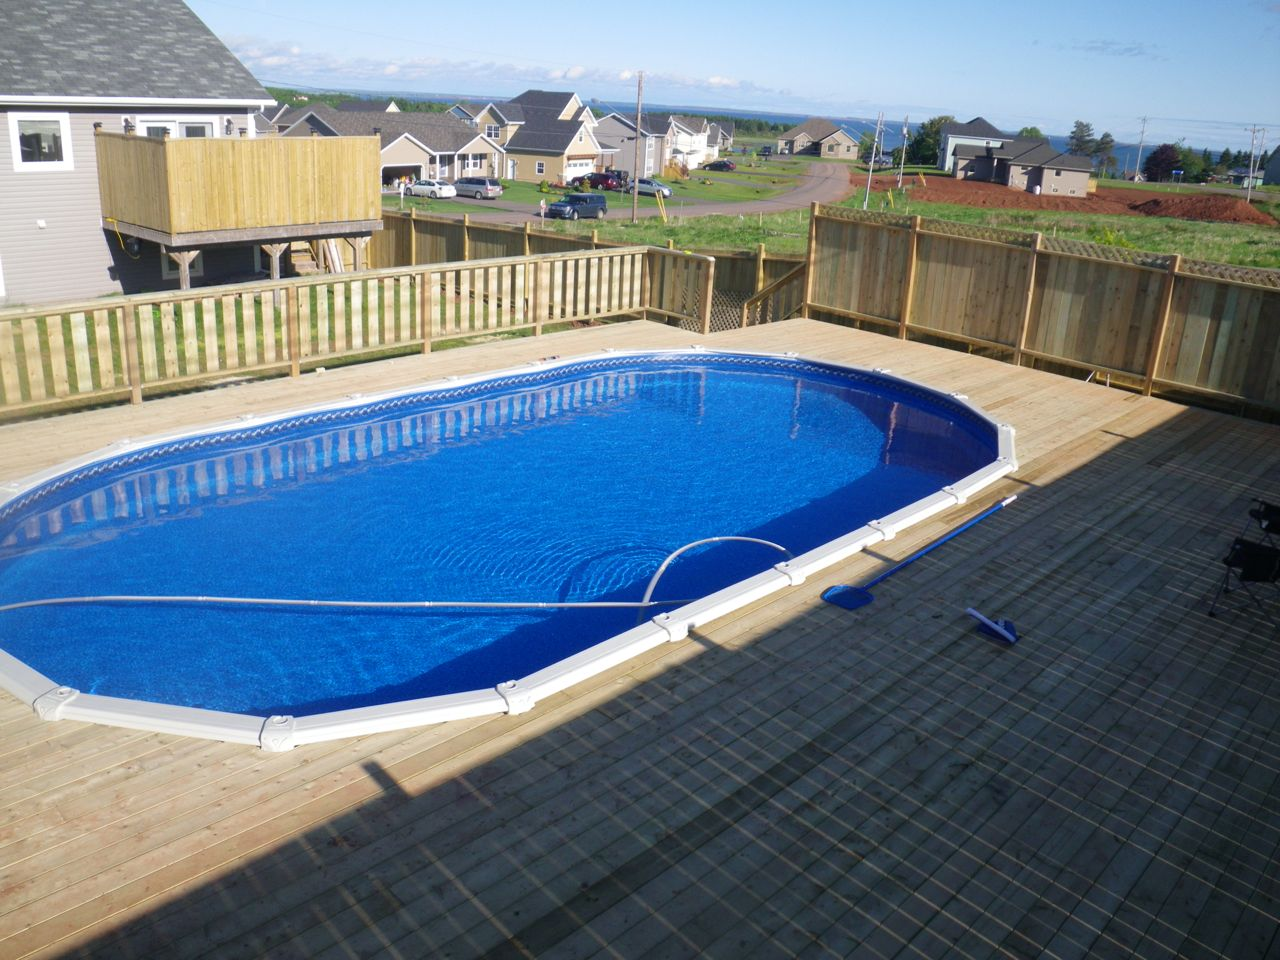 18x34 Oval Pool